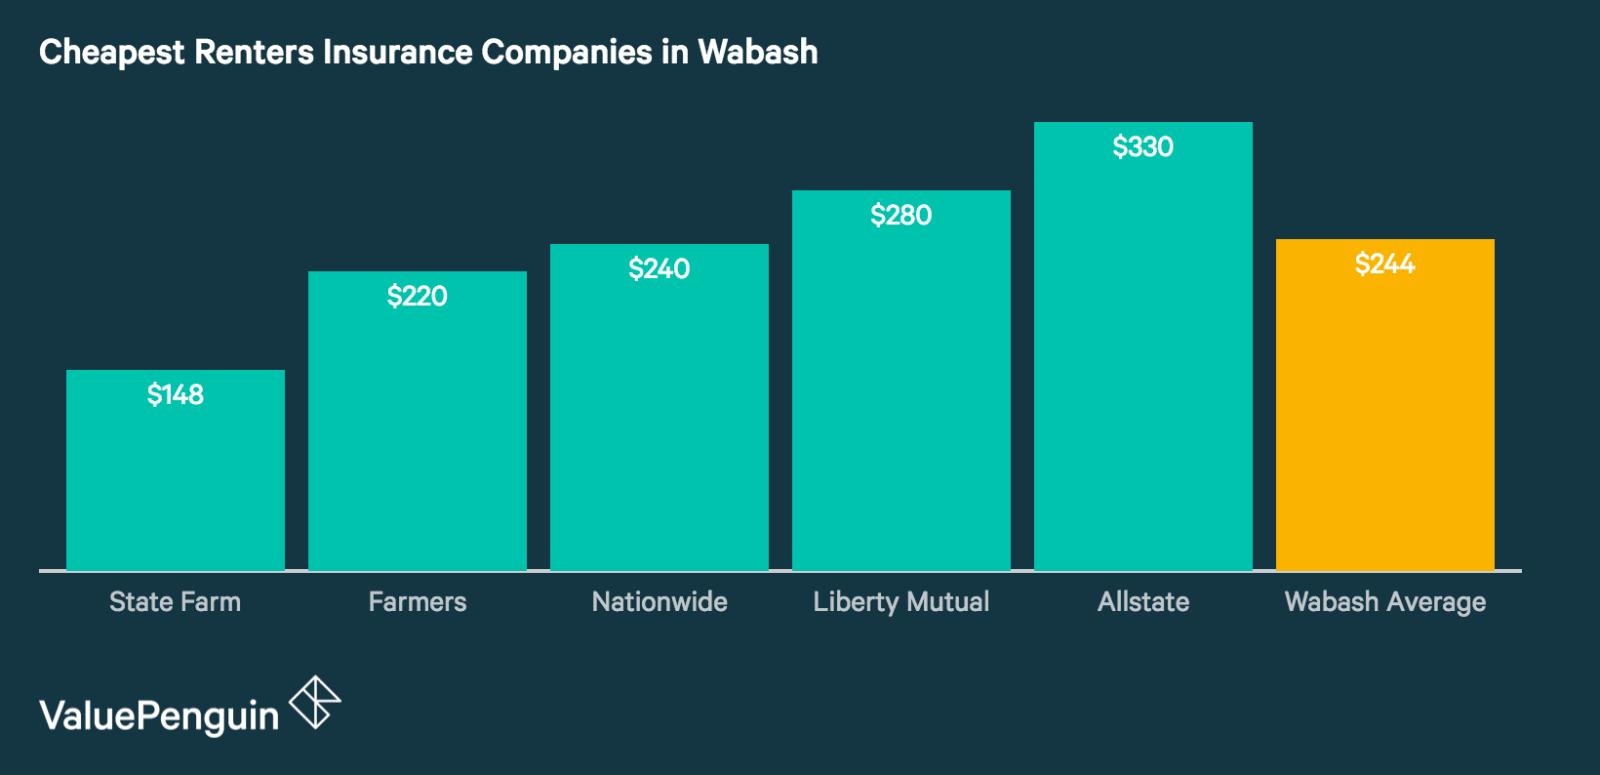 Best Renters Insurance Companies in Wabash